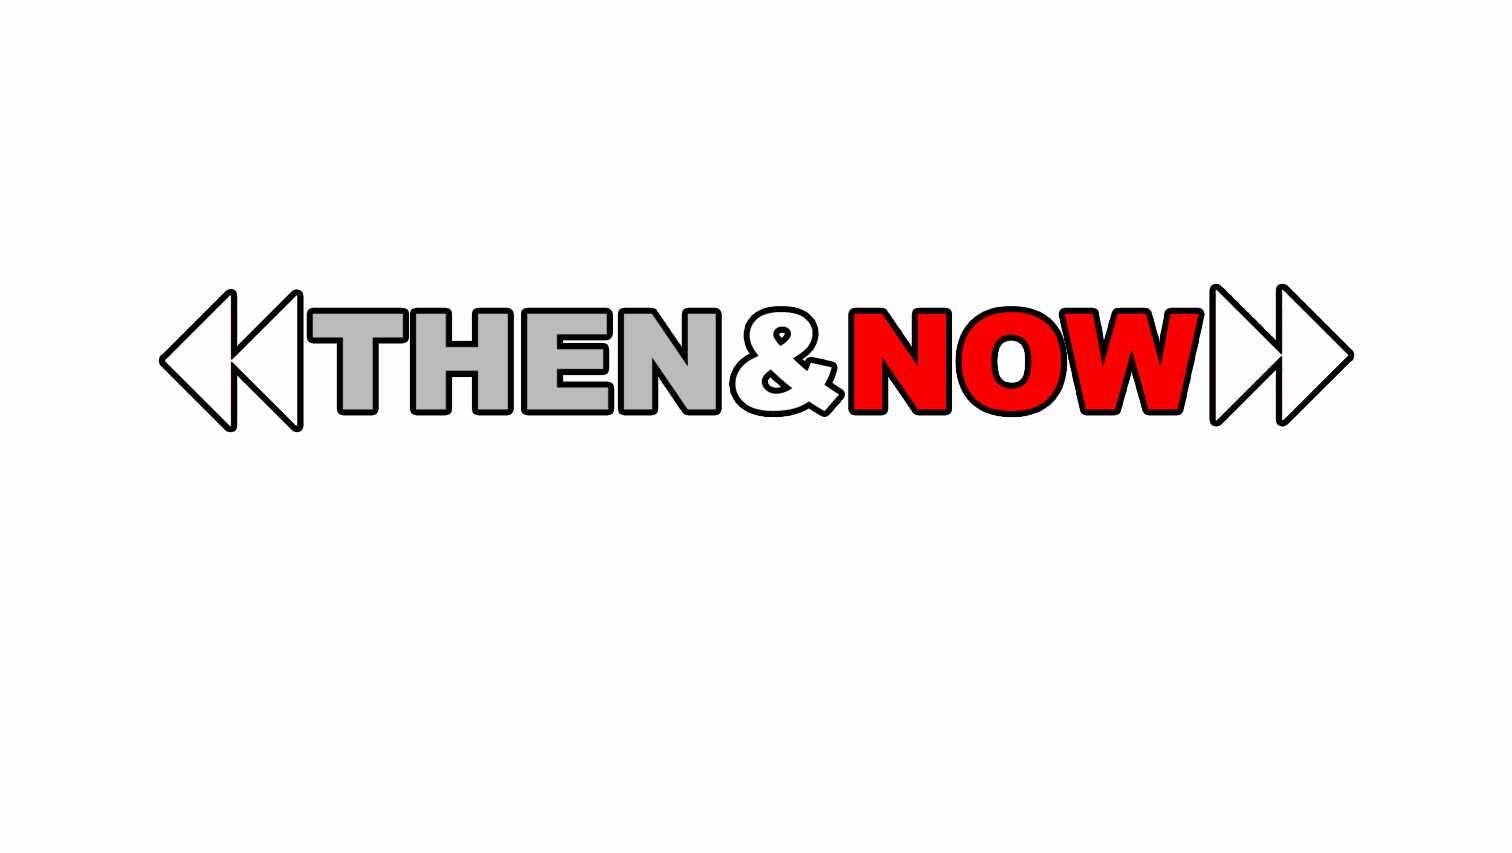 then & now_1533250839716.jpg.jpg